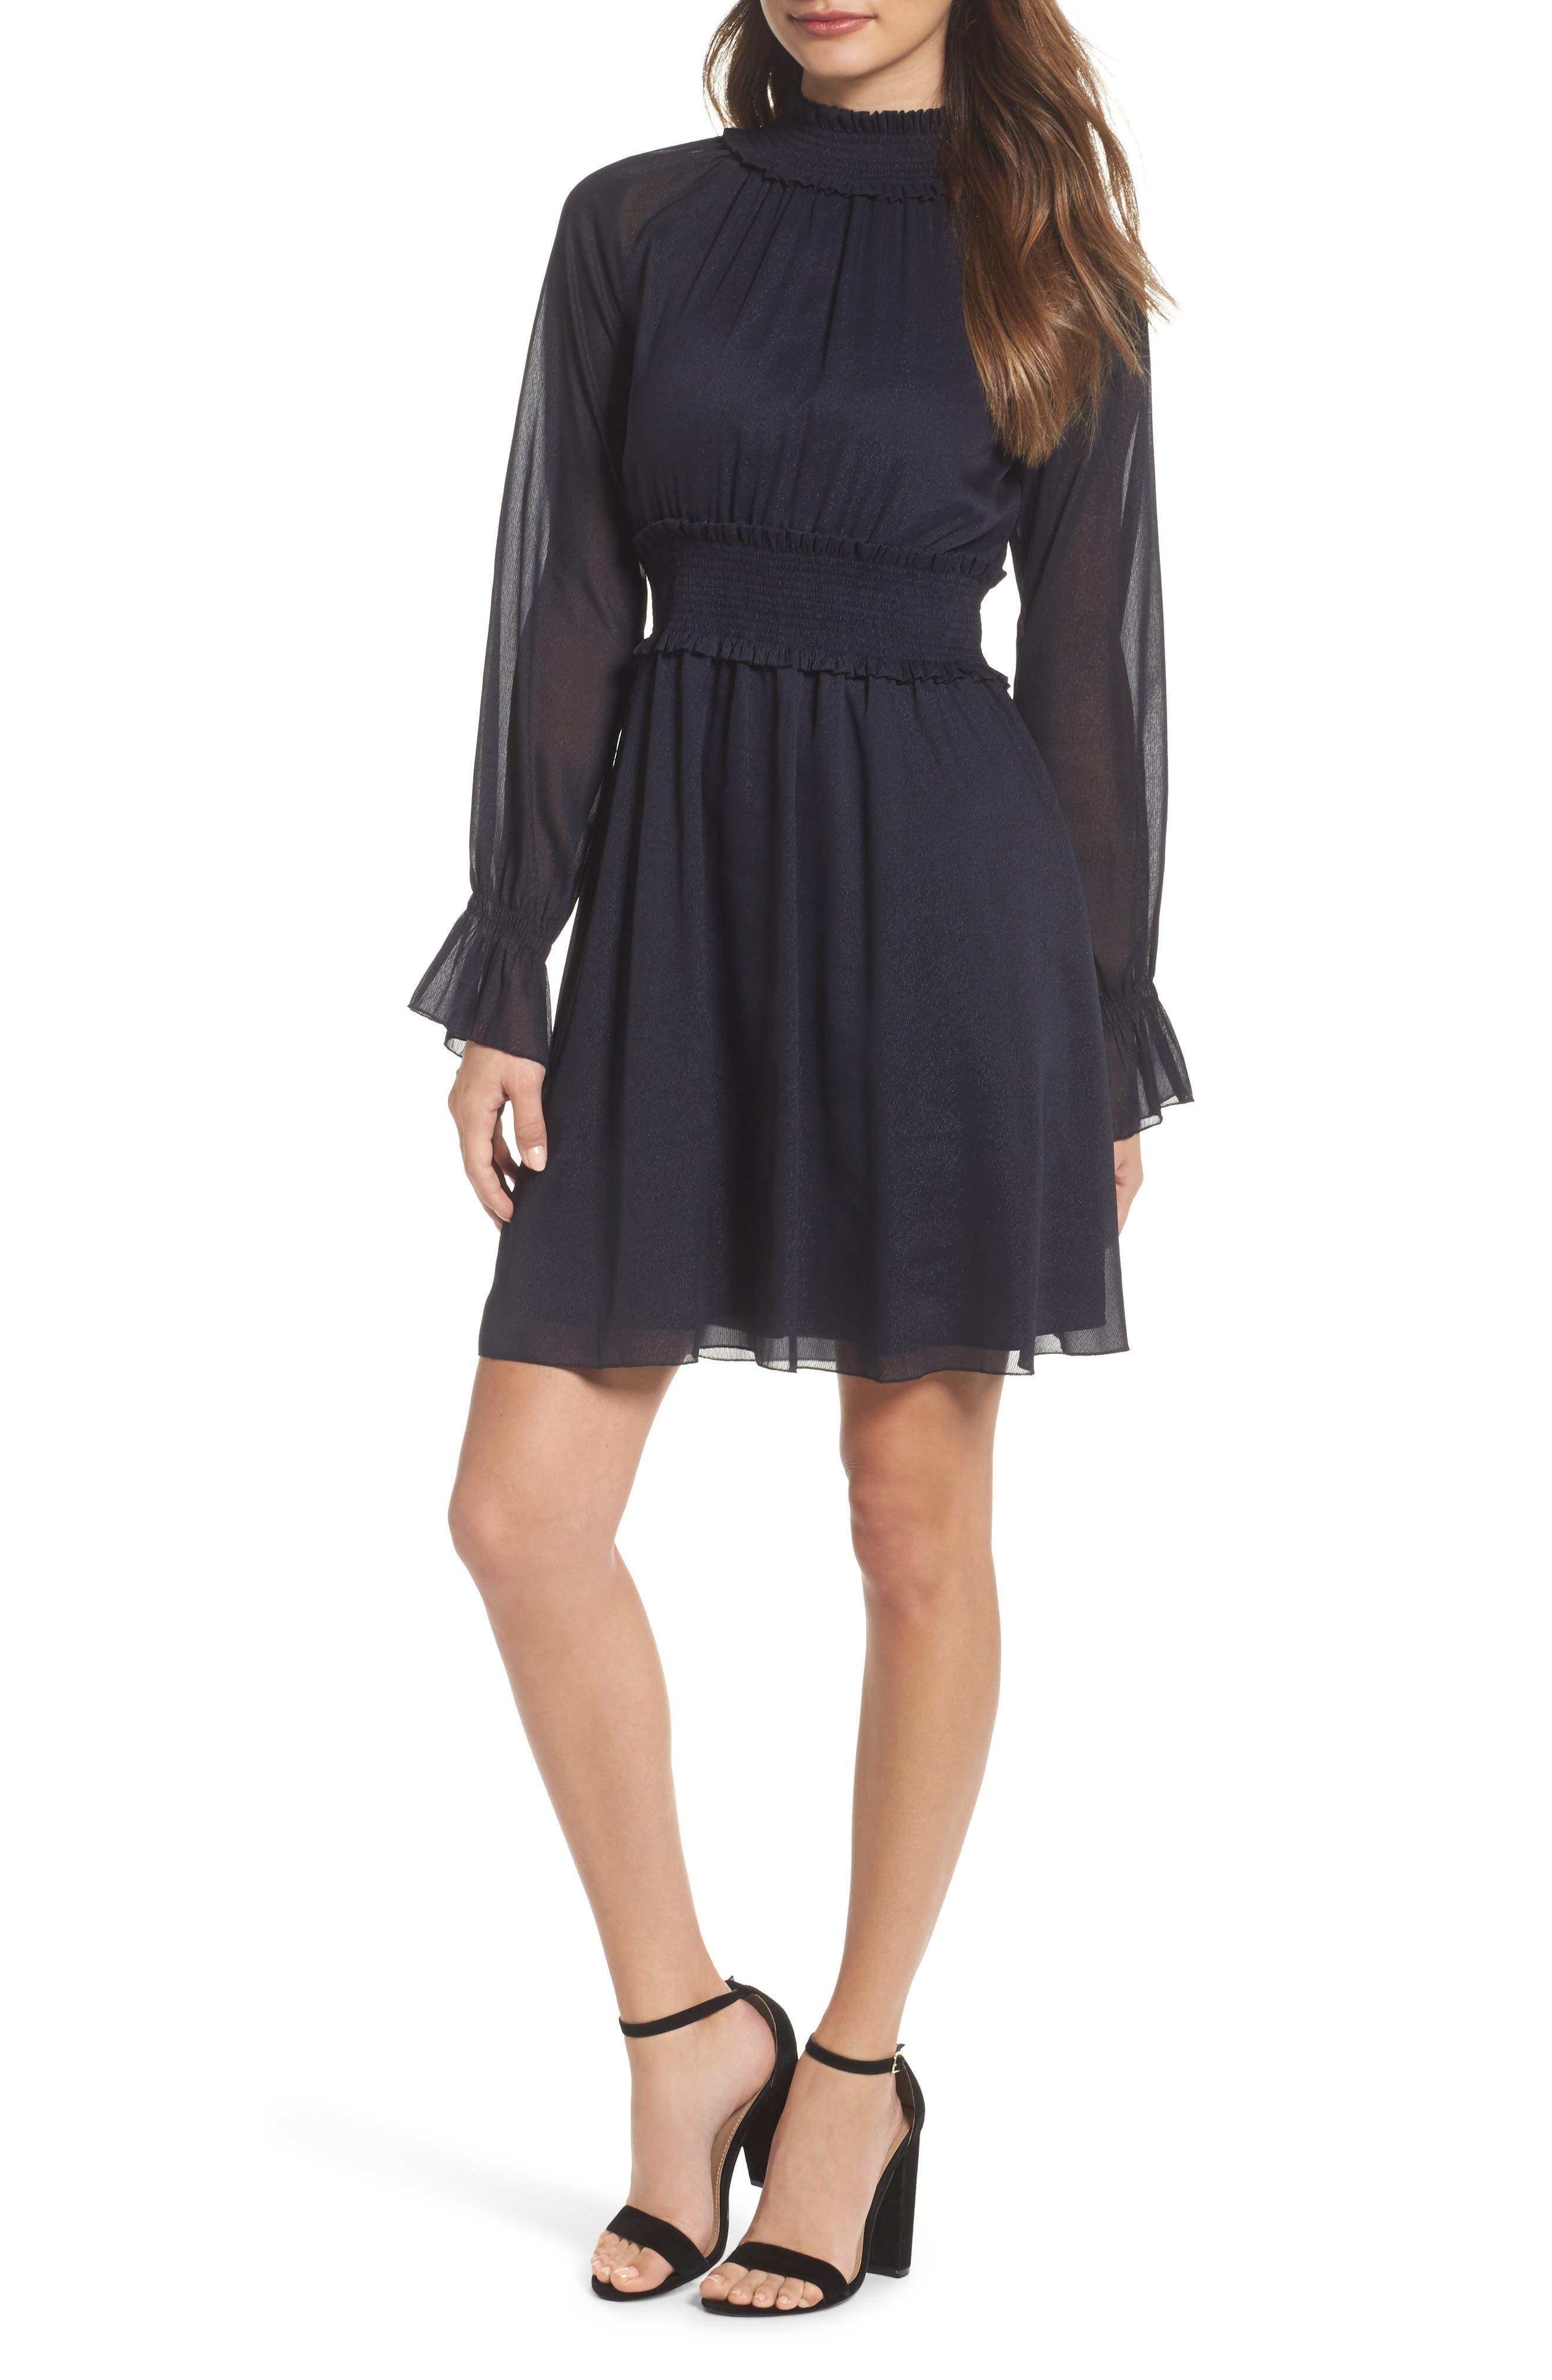 Chelsea28 Smocked Long Sleeve Dress